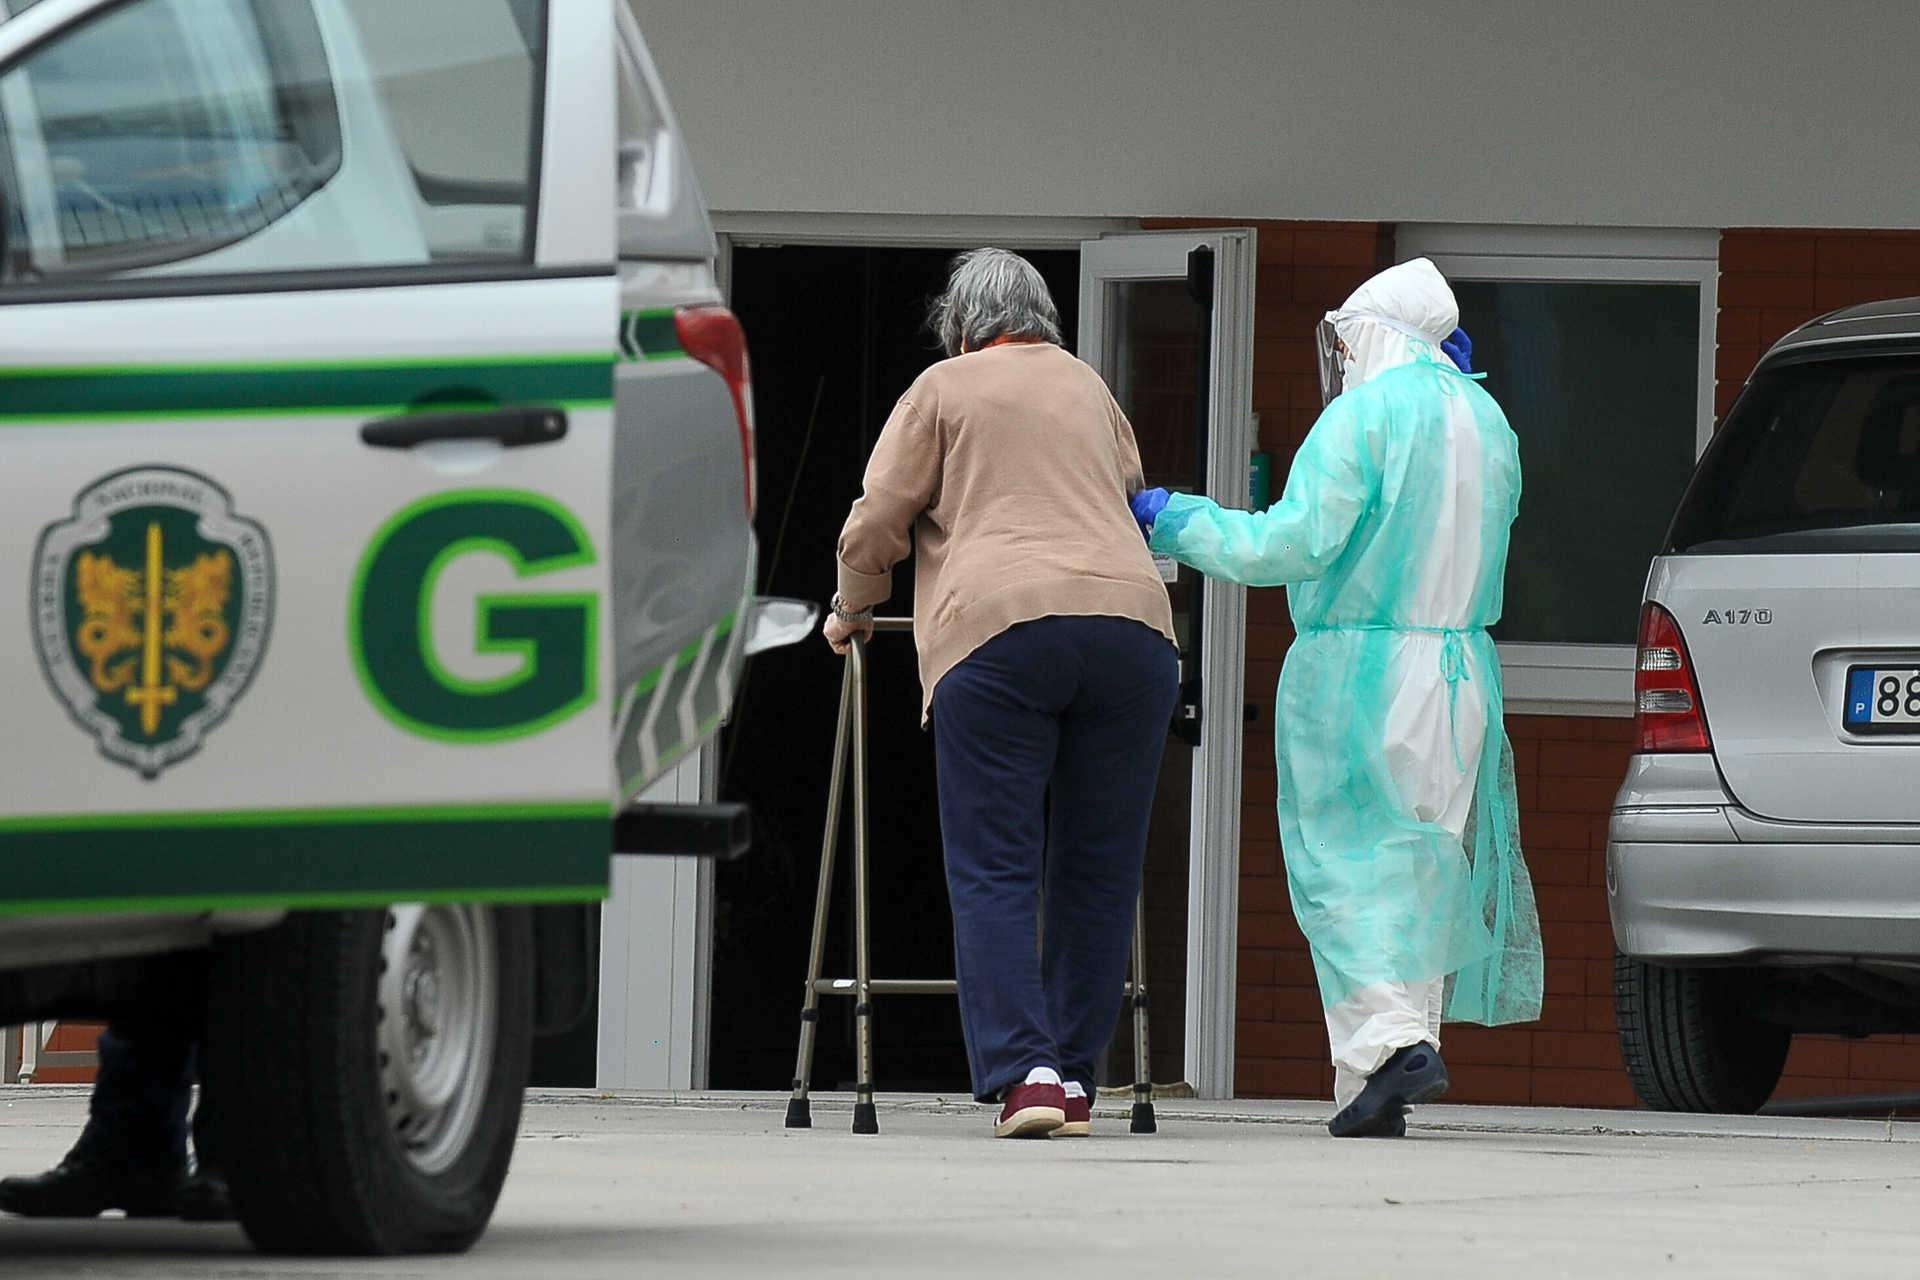 allbet gmaing〖官网〗:葡萄牙一养老院发生群集性熏染 45『位老人』确诊